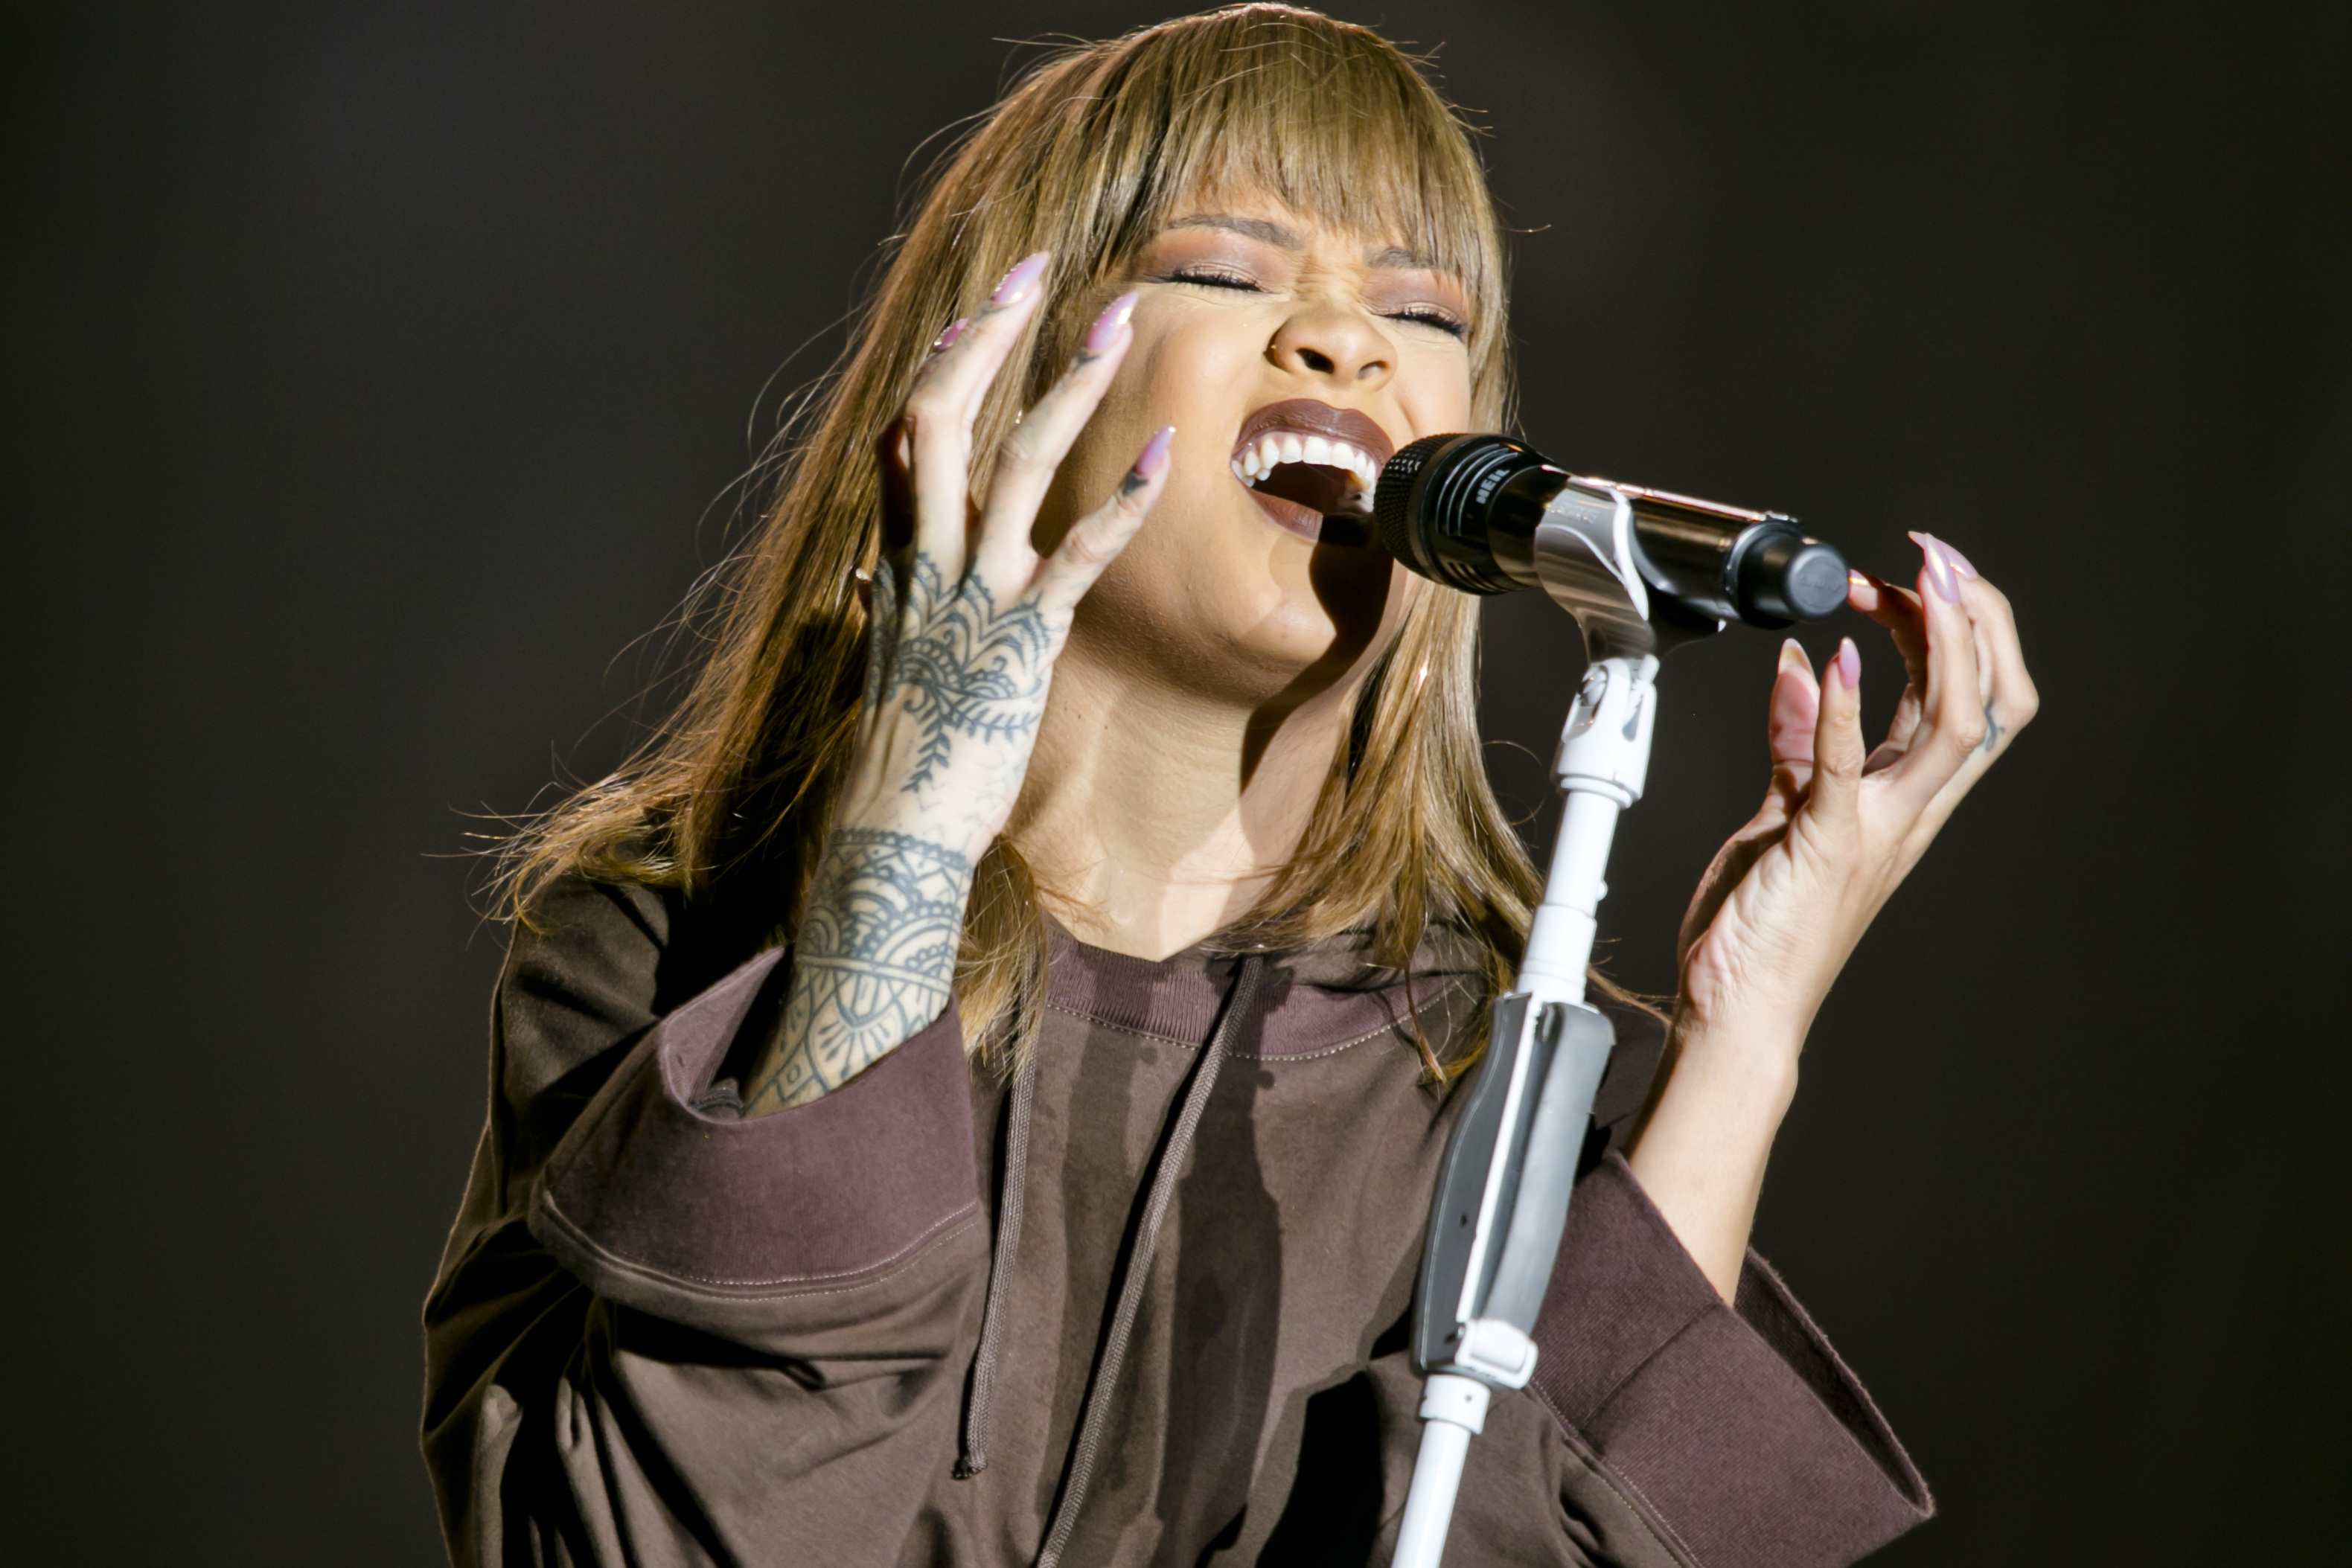 Rihanna at Sziget Festival, Budapest, Hungary - 10 August 2016